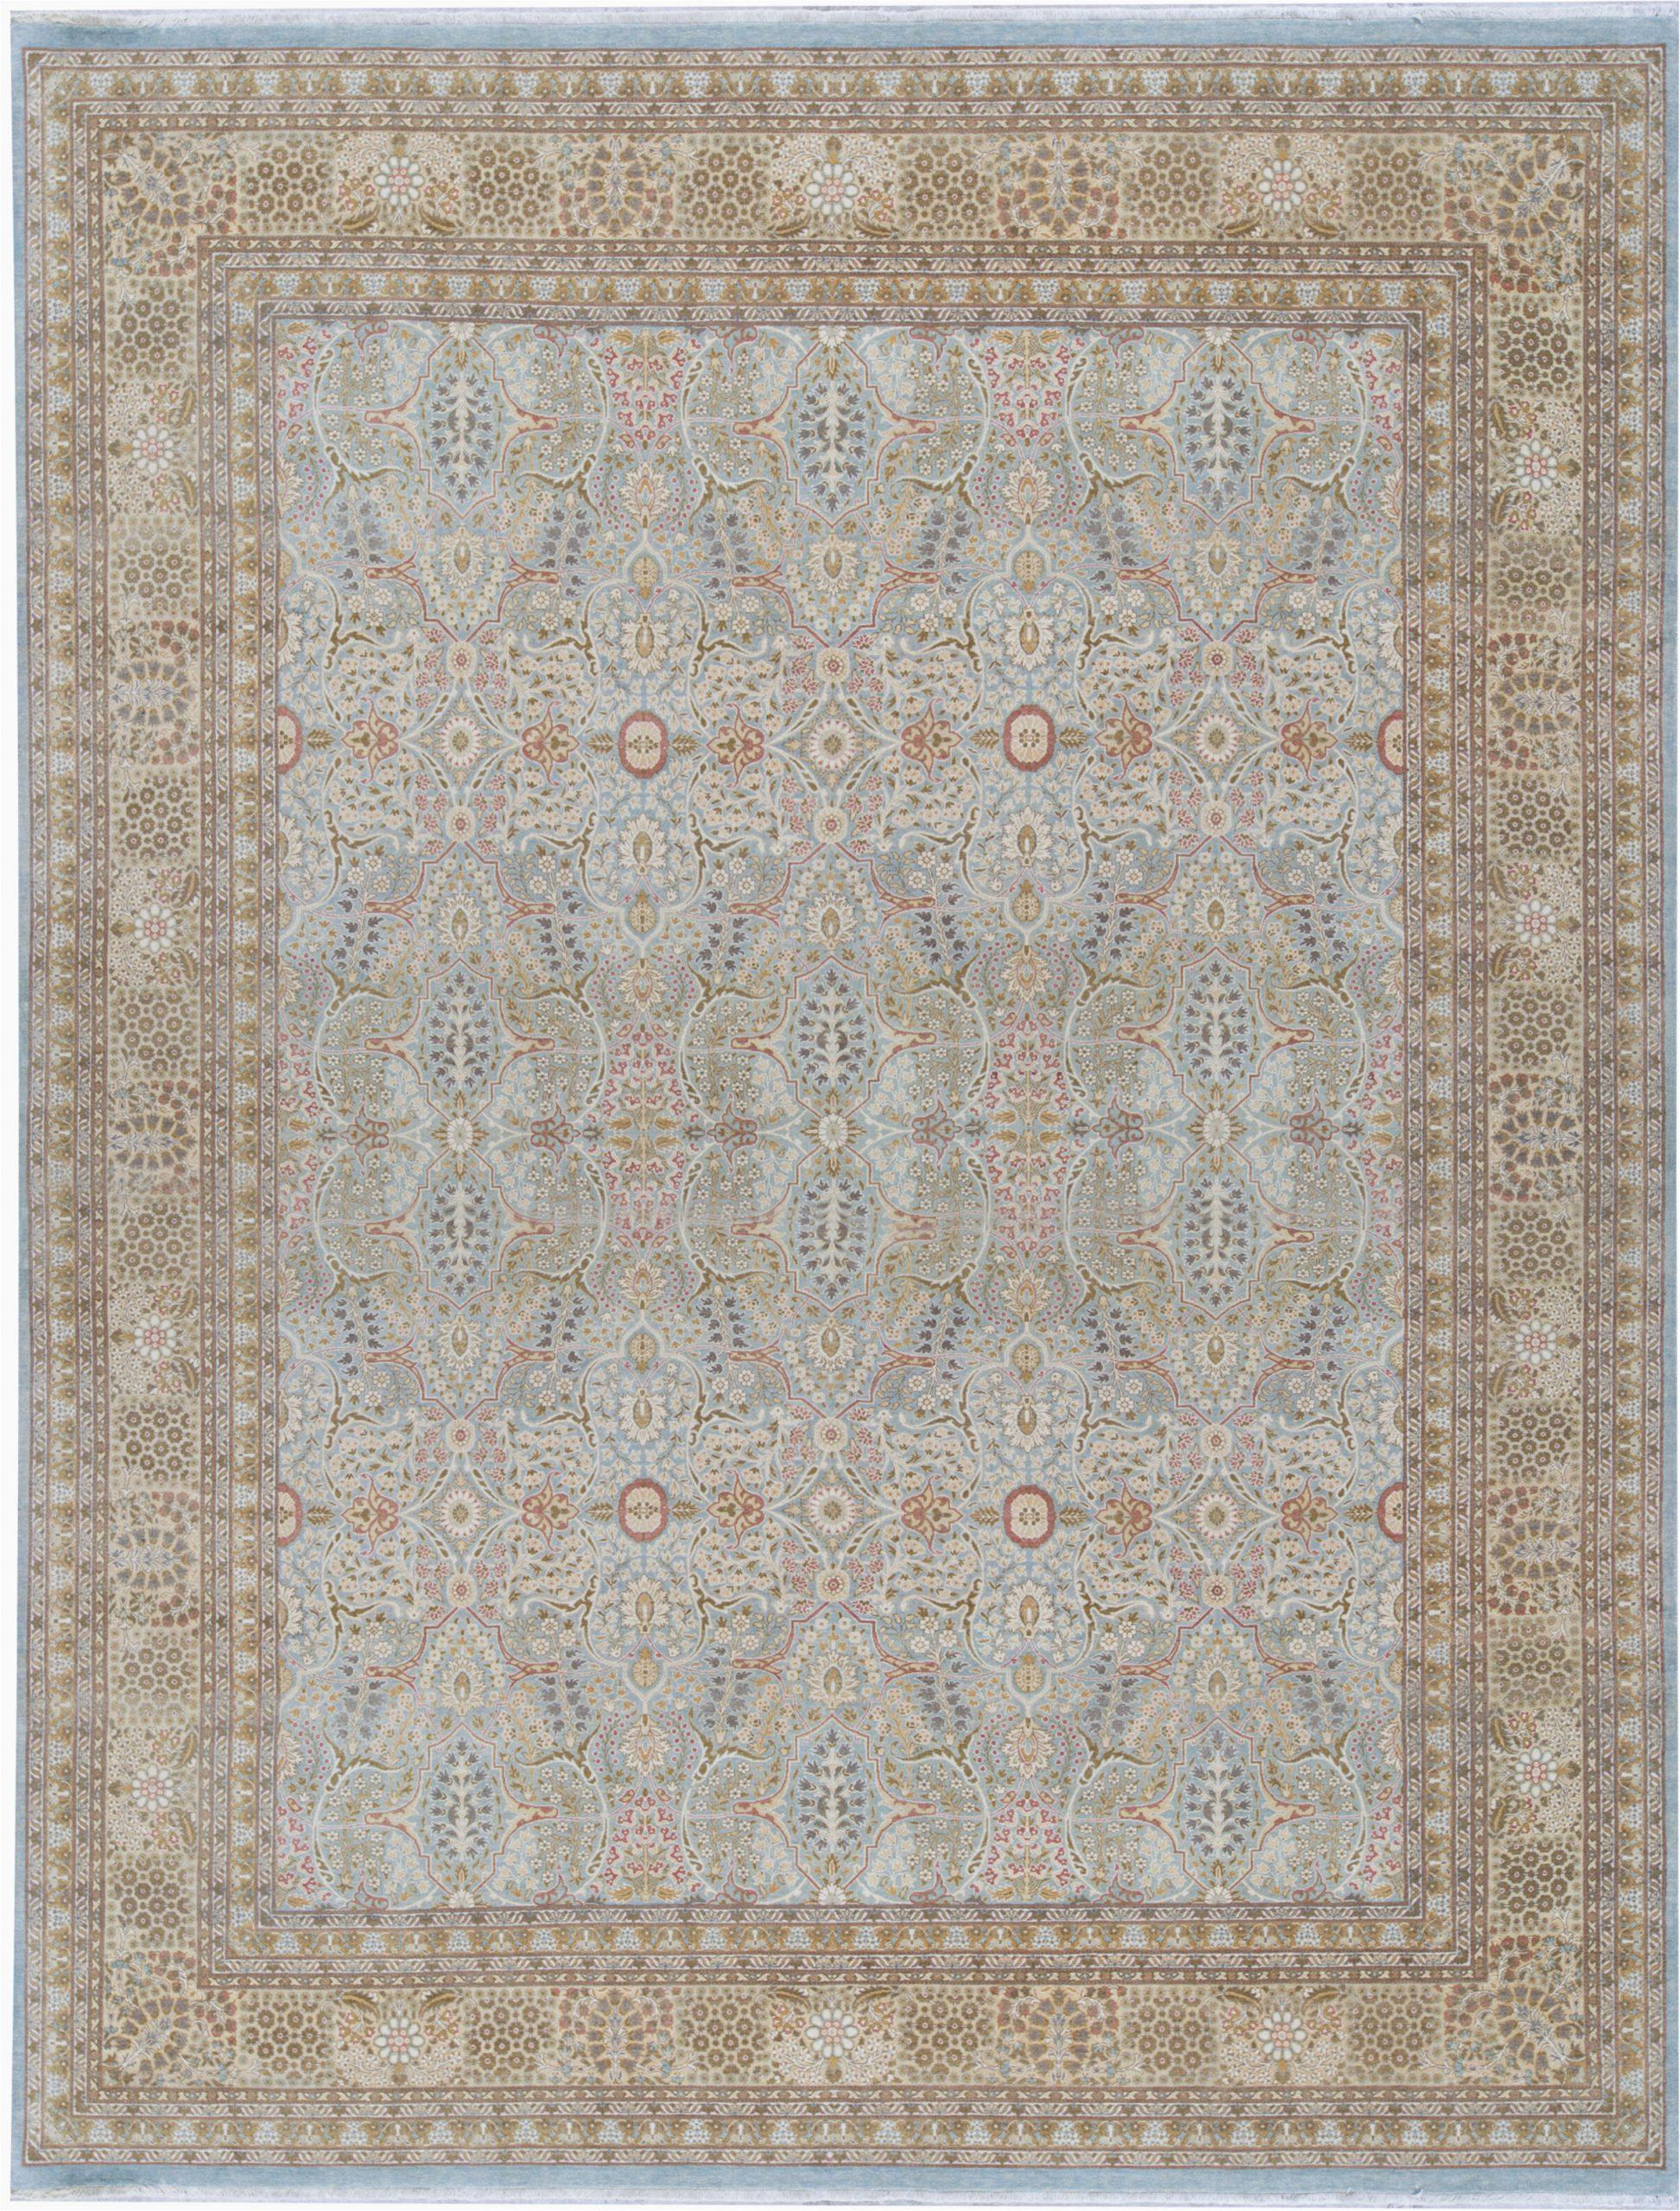 oriental hand knotted wool light bluecream area rug